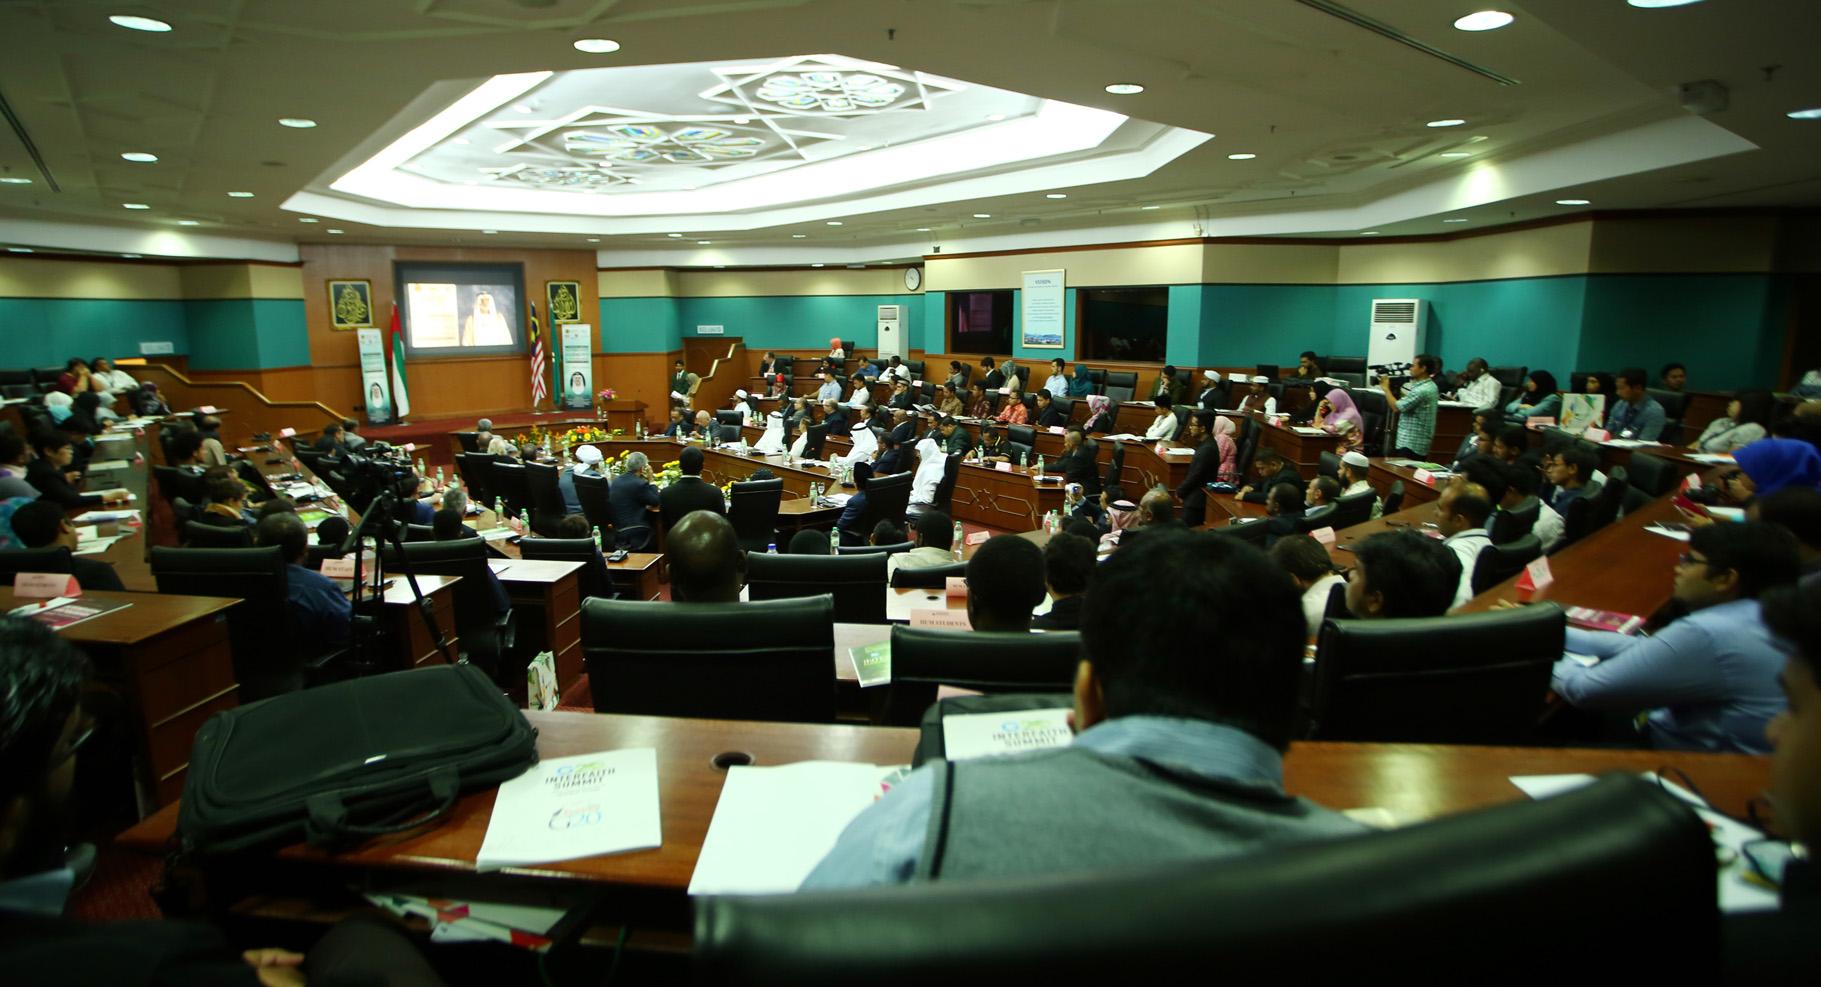 Keynote speech audience.jpg